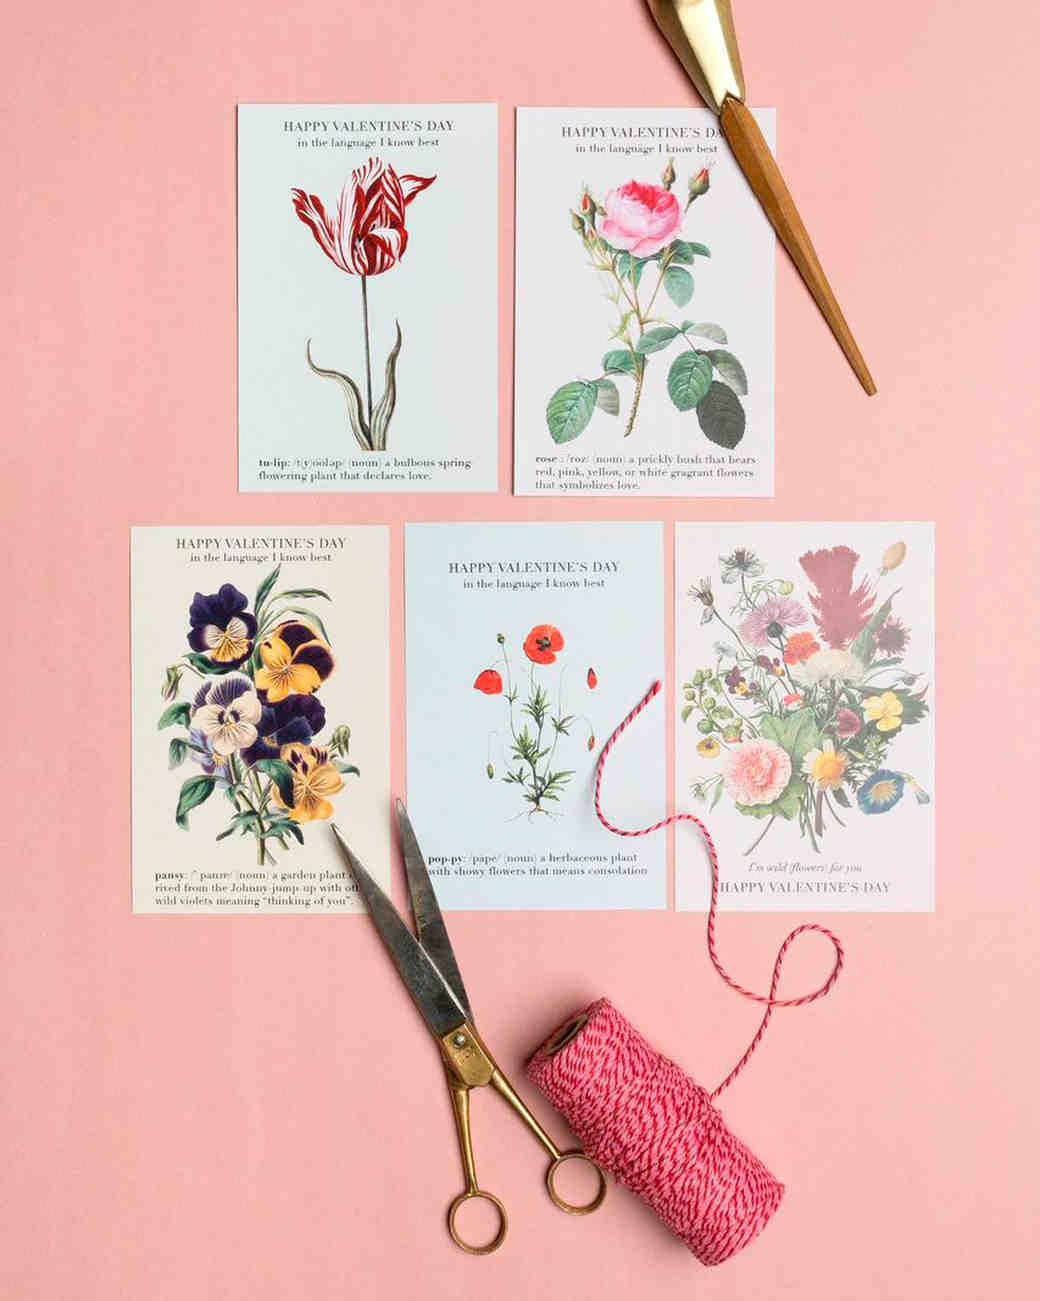 5 Last Minute Diy Ideas For Saying Happy Valentine S Day Martha